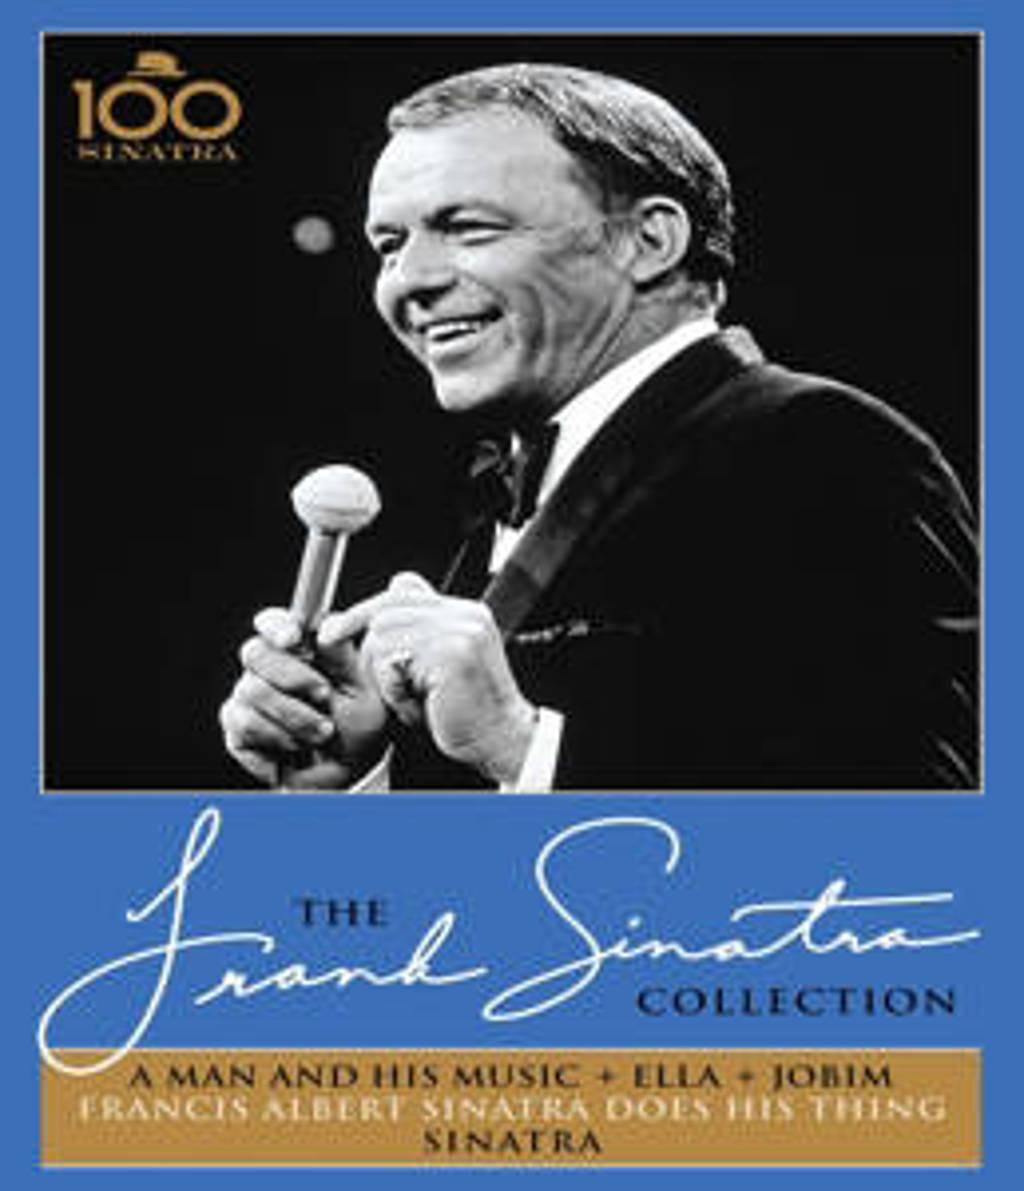 Frank Sinatra - A Man And His Music + Ella + Jobim (DVD)